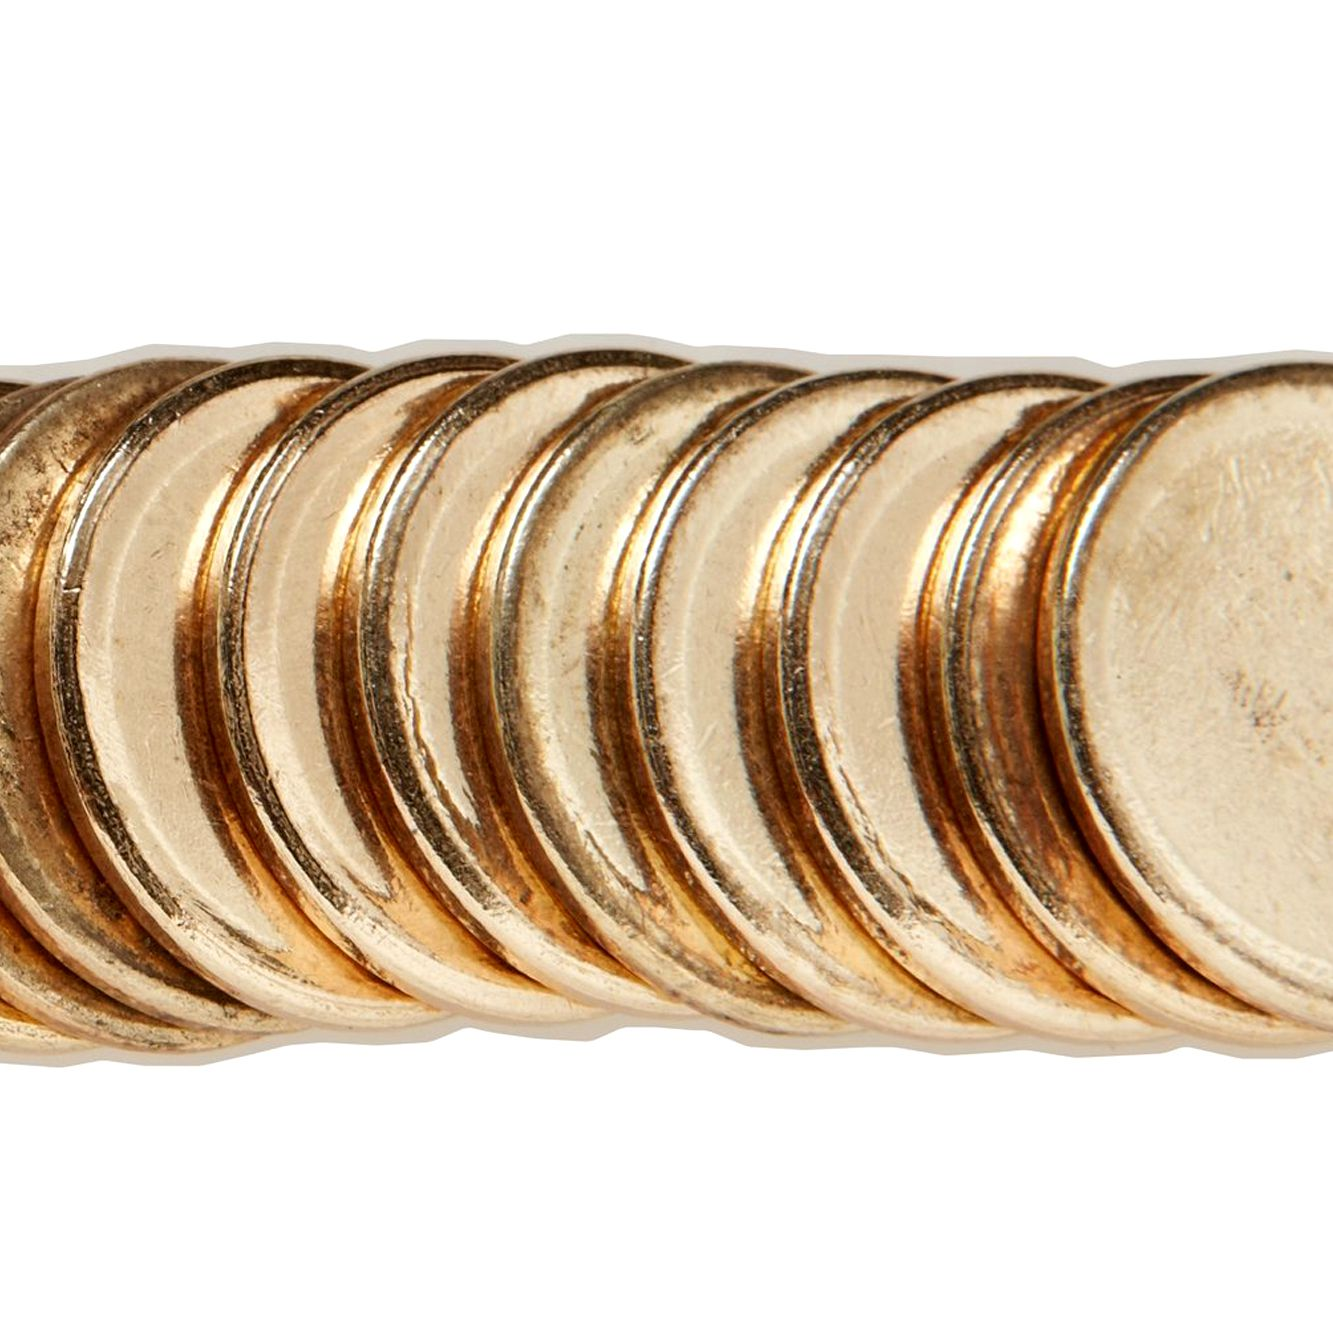 National Large Half Dollar Coin Board Meghrig Blank Plain Fits Wayte Raymond